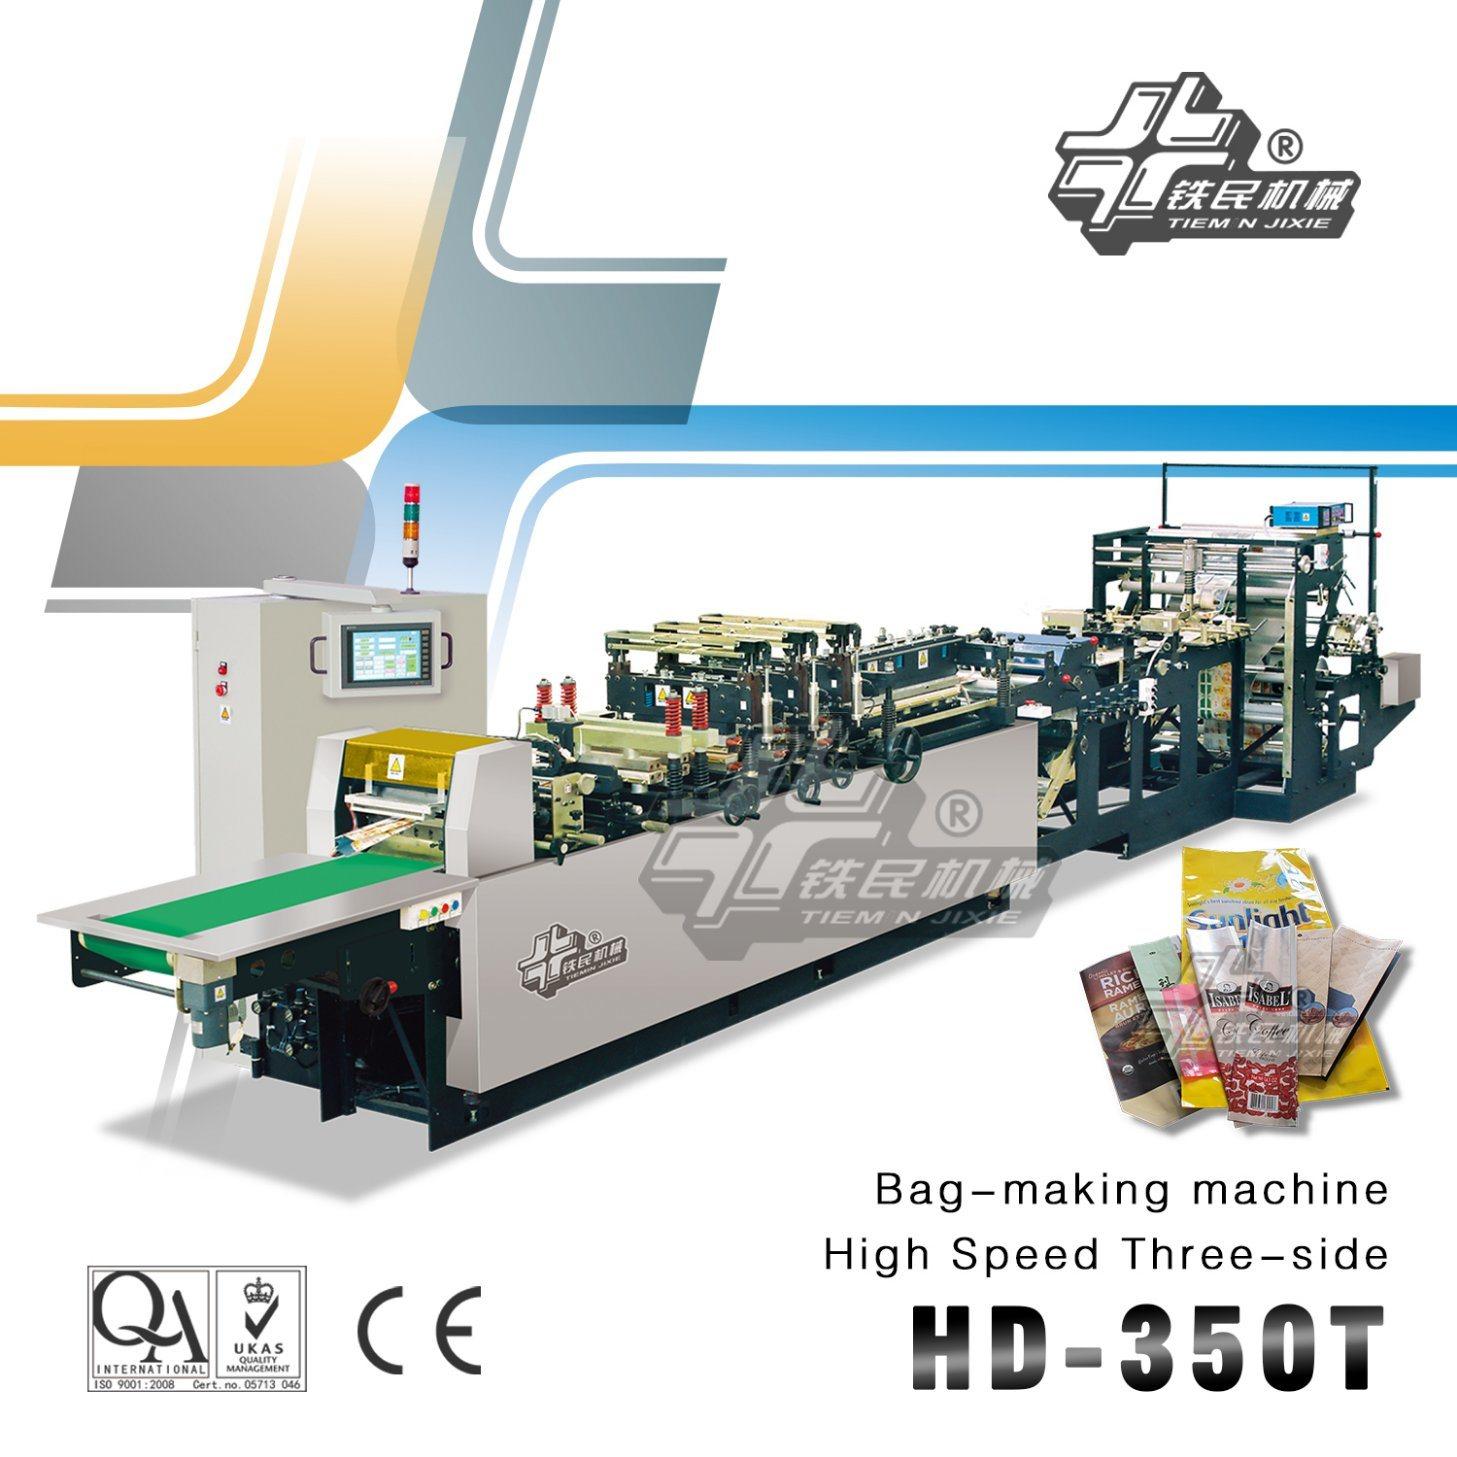 High Speed Bag-Seeal Bag-Making Machine (Standard model) HD-350t